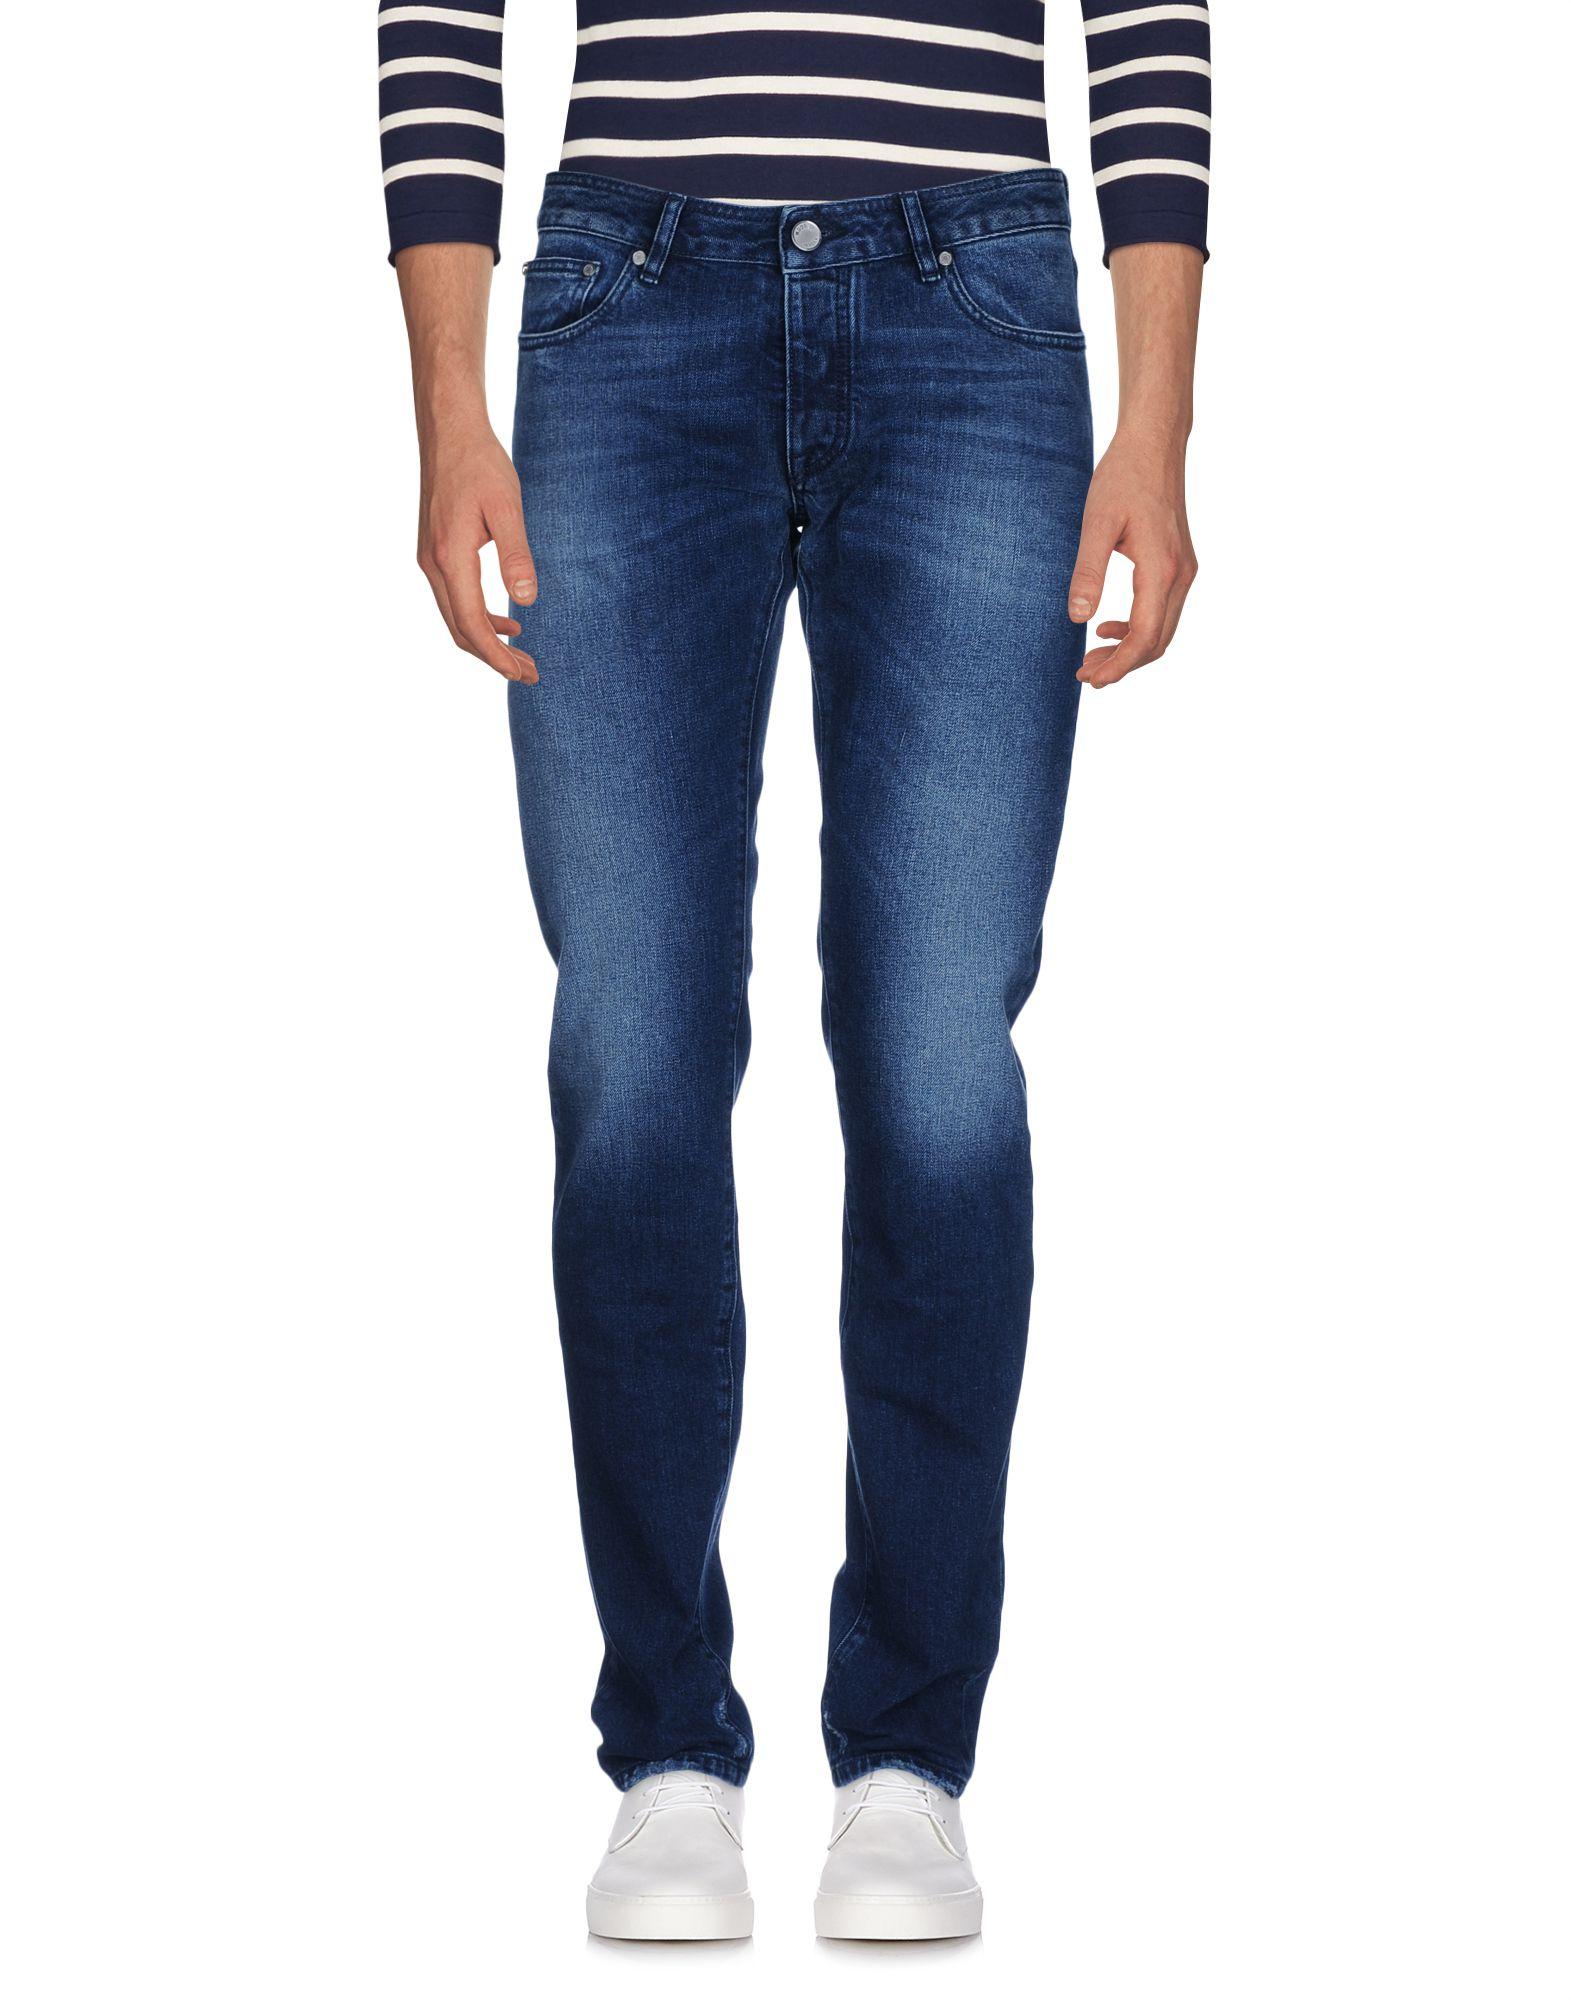 Pantaloni Jeans Moorer Uomo - Acquista online su